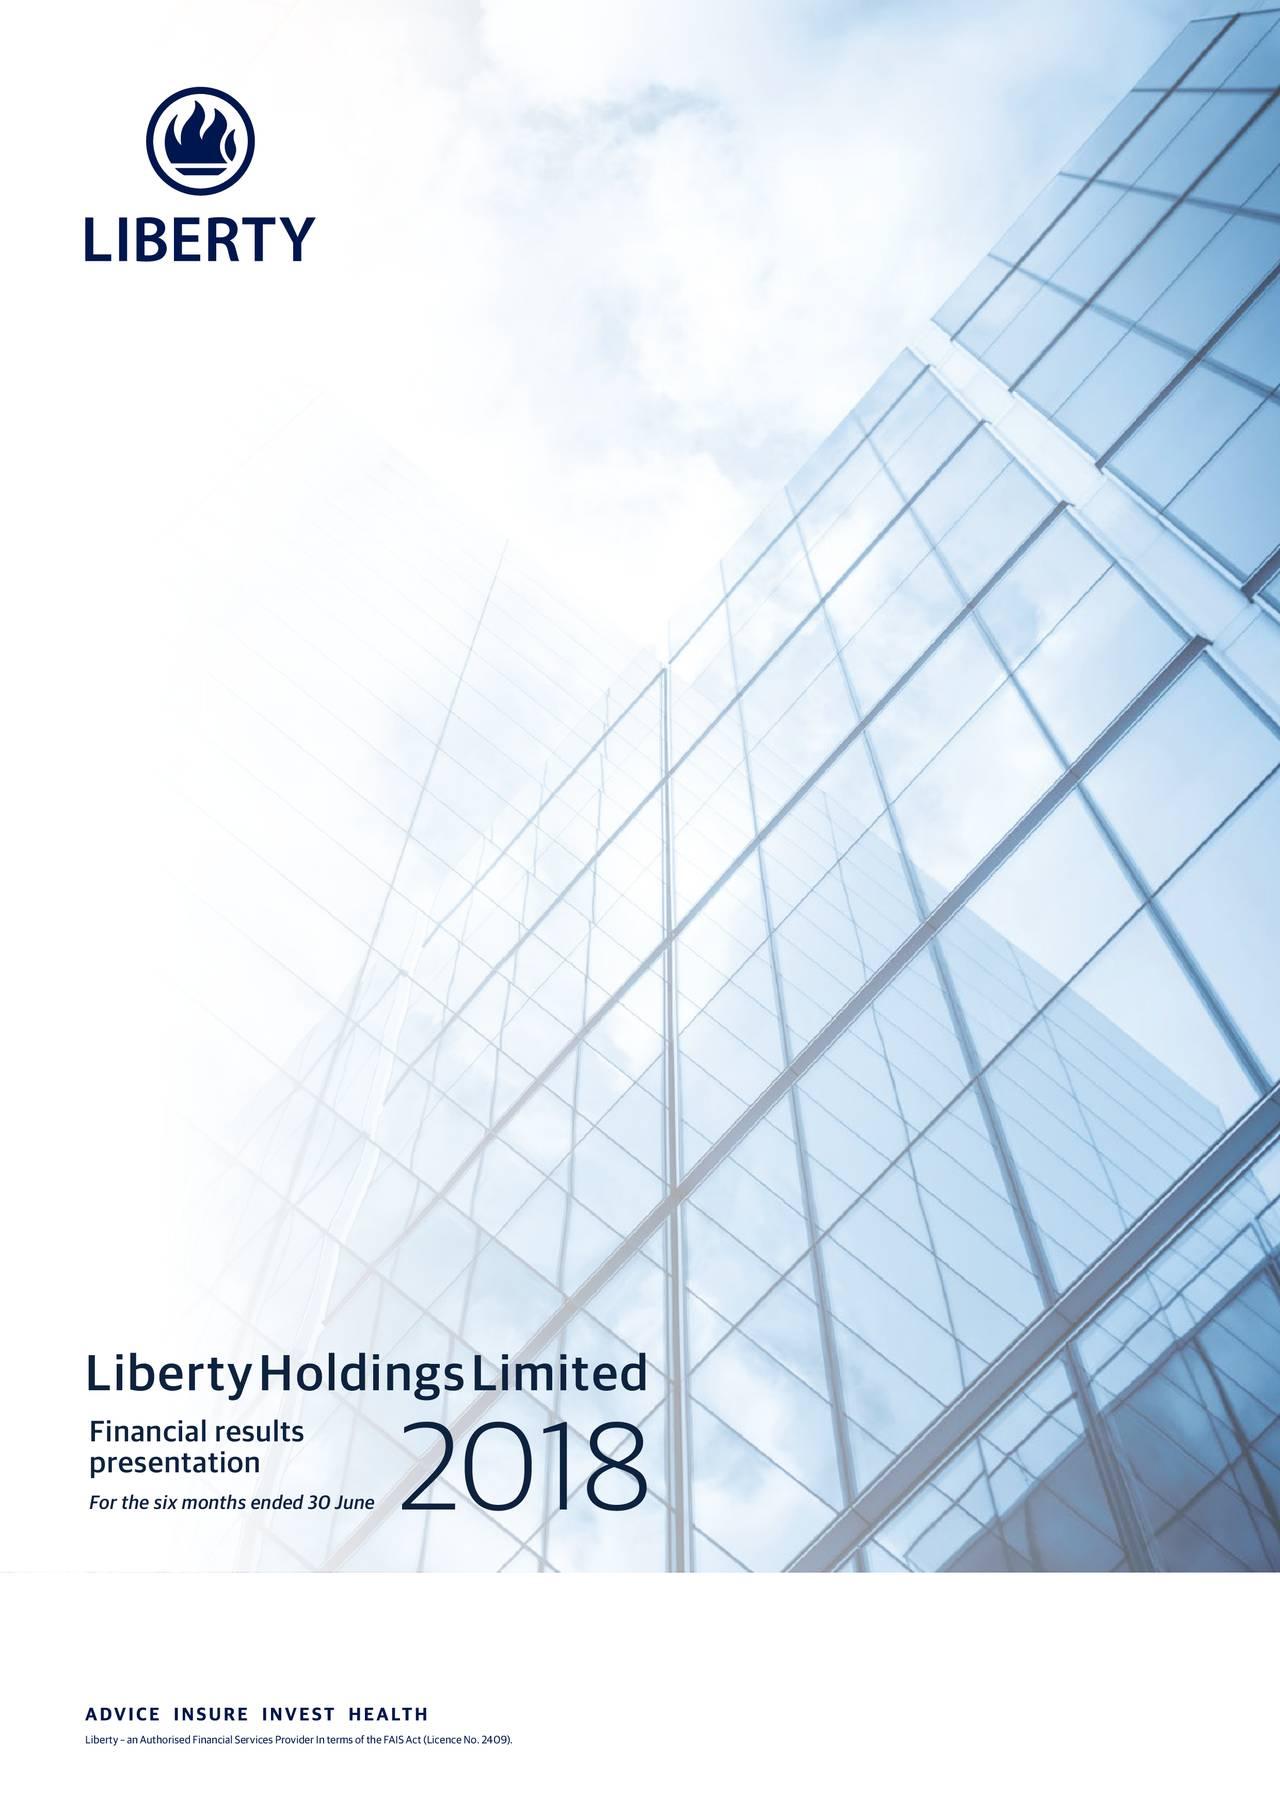 presentationults Forthesixmonths2018d30June Liberty–anAuthorisedFinancialServicesProviderIntermsoftheFAISAct(LicenceNo.2409).